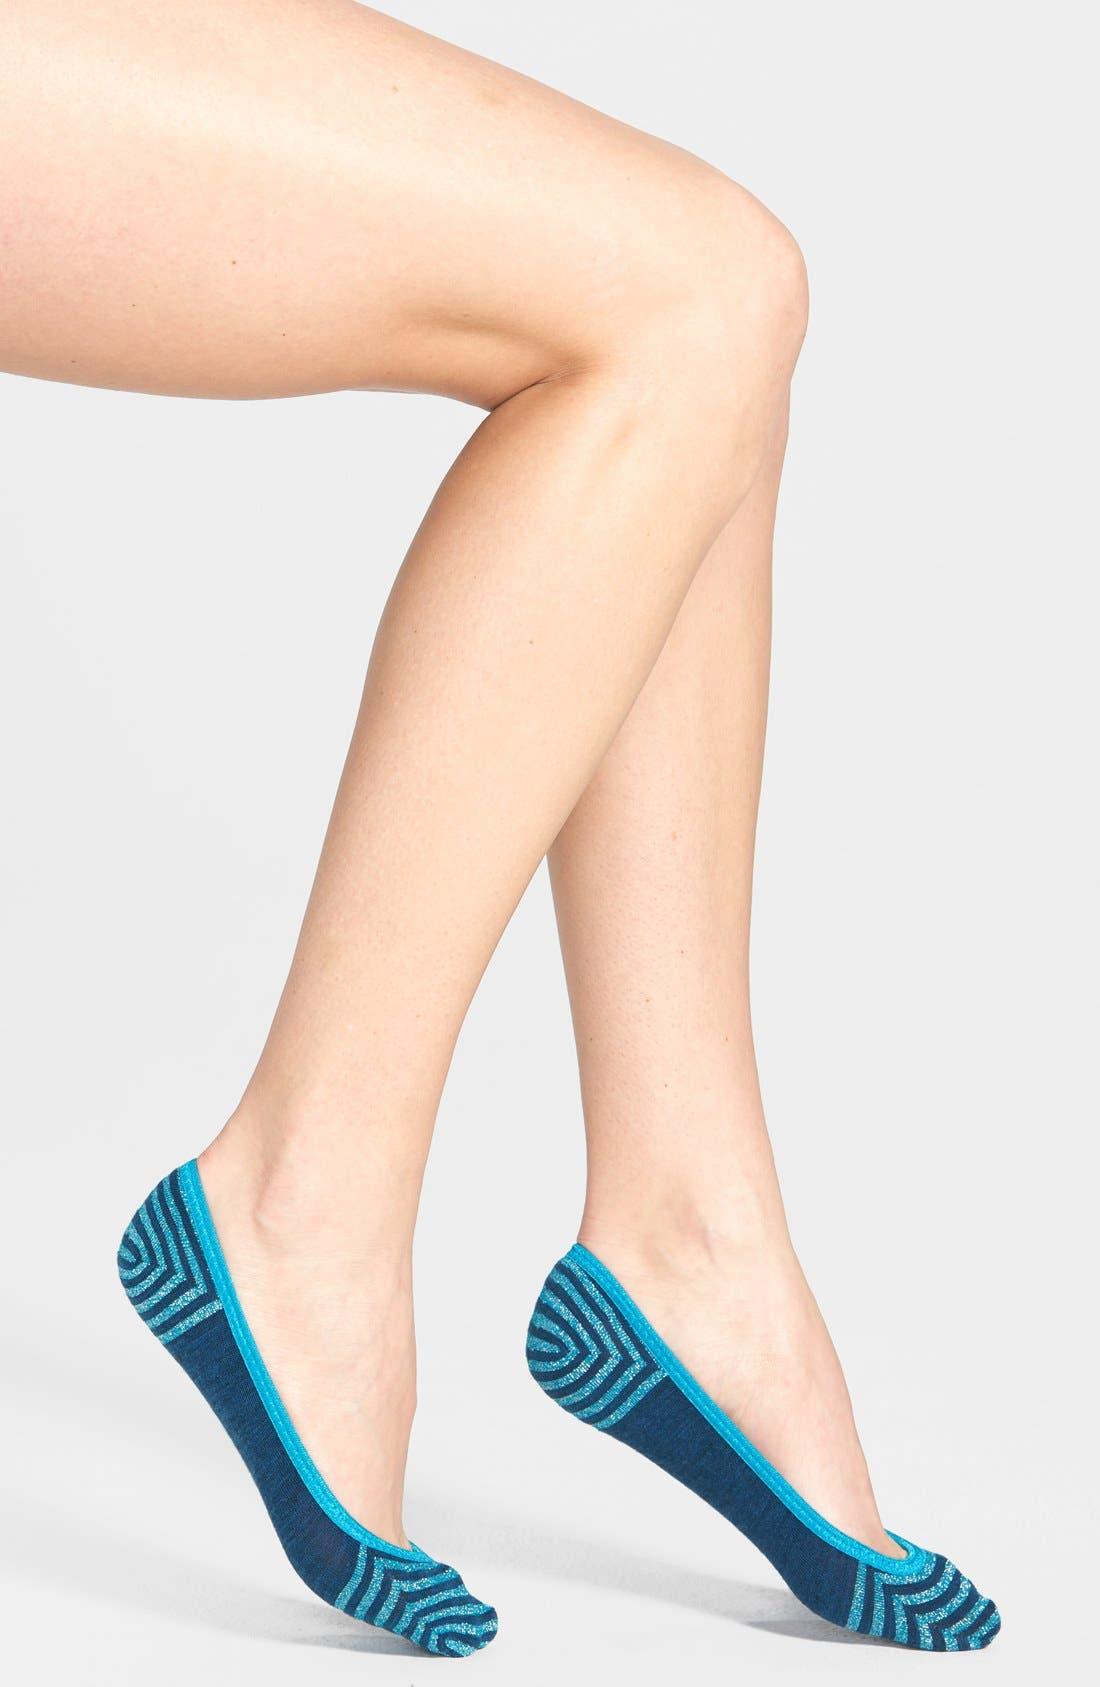 Alternate Image 1 Selected - Smartwool Metallic Stripe Merino Wool No-Show Socks (Nordstrom Exclusive)